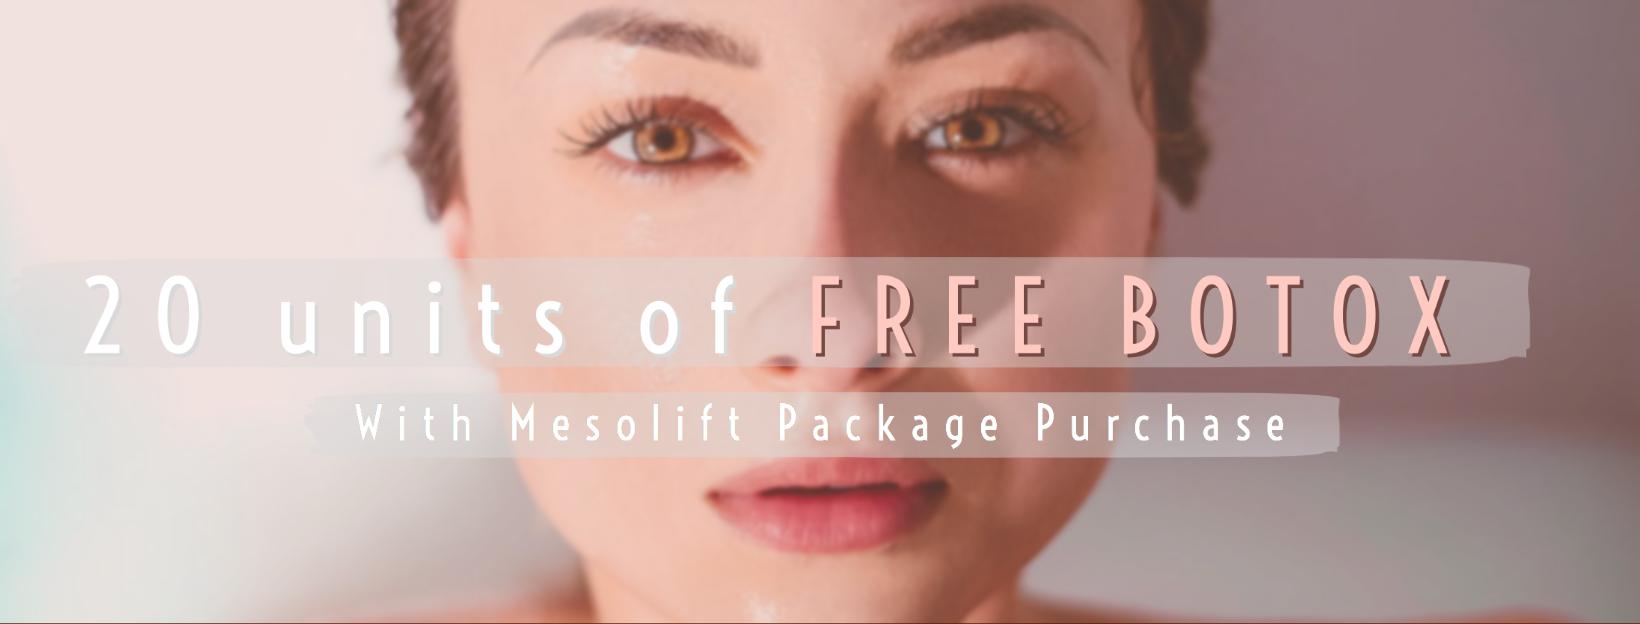 meso free botox